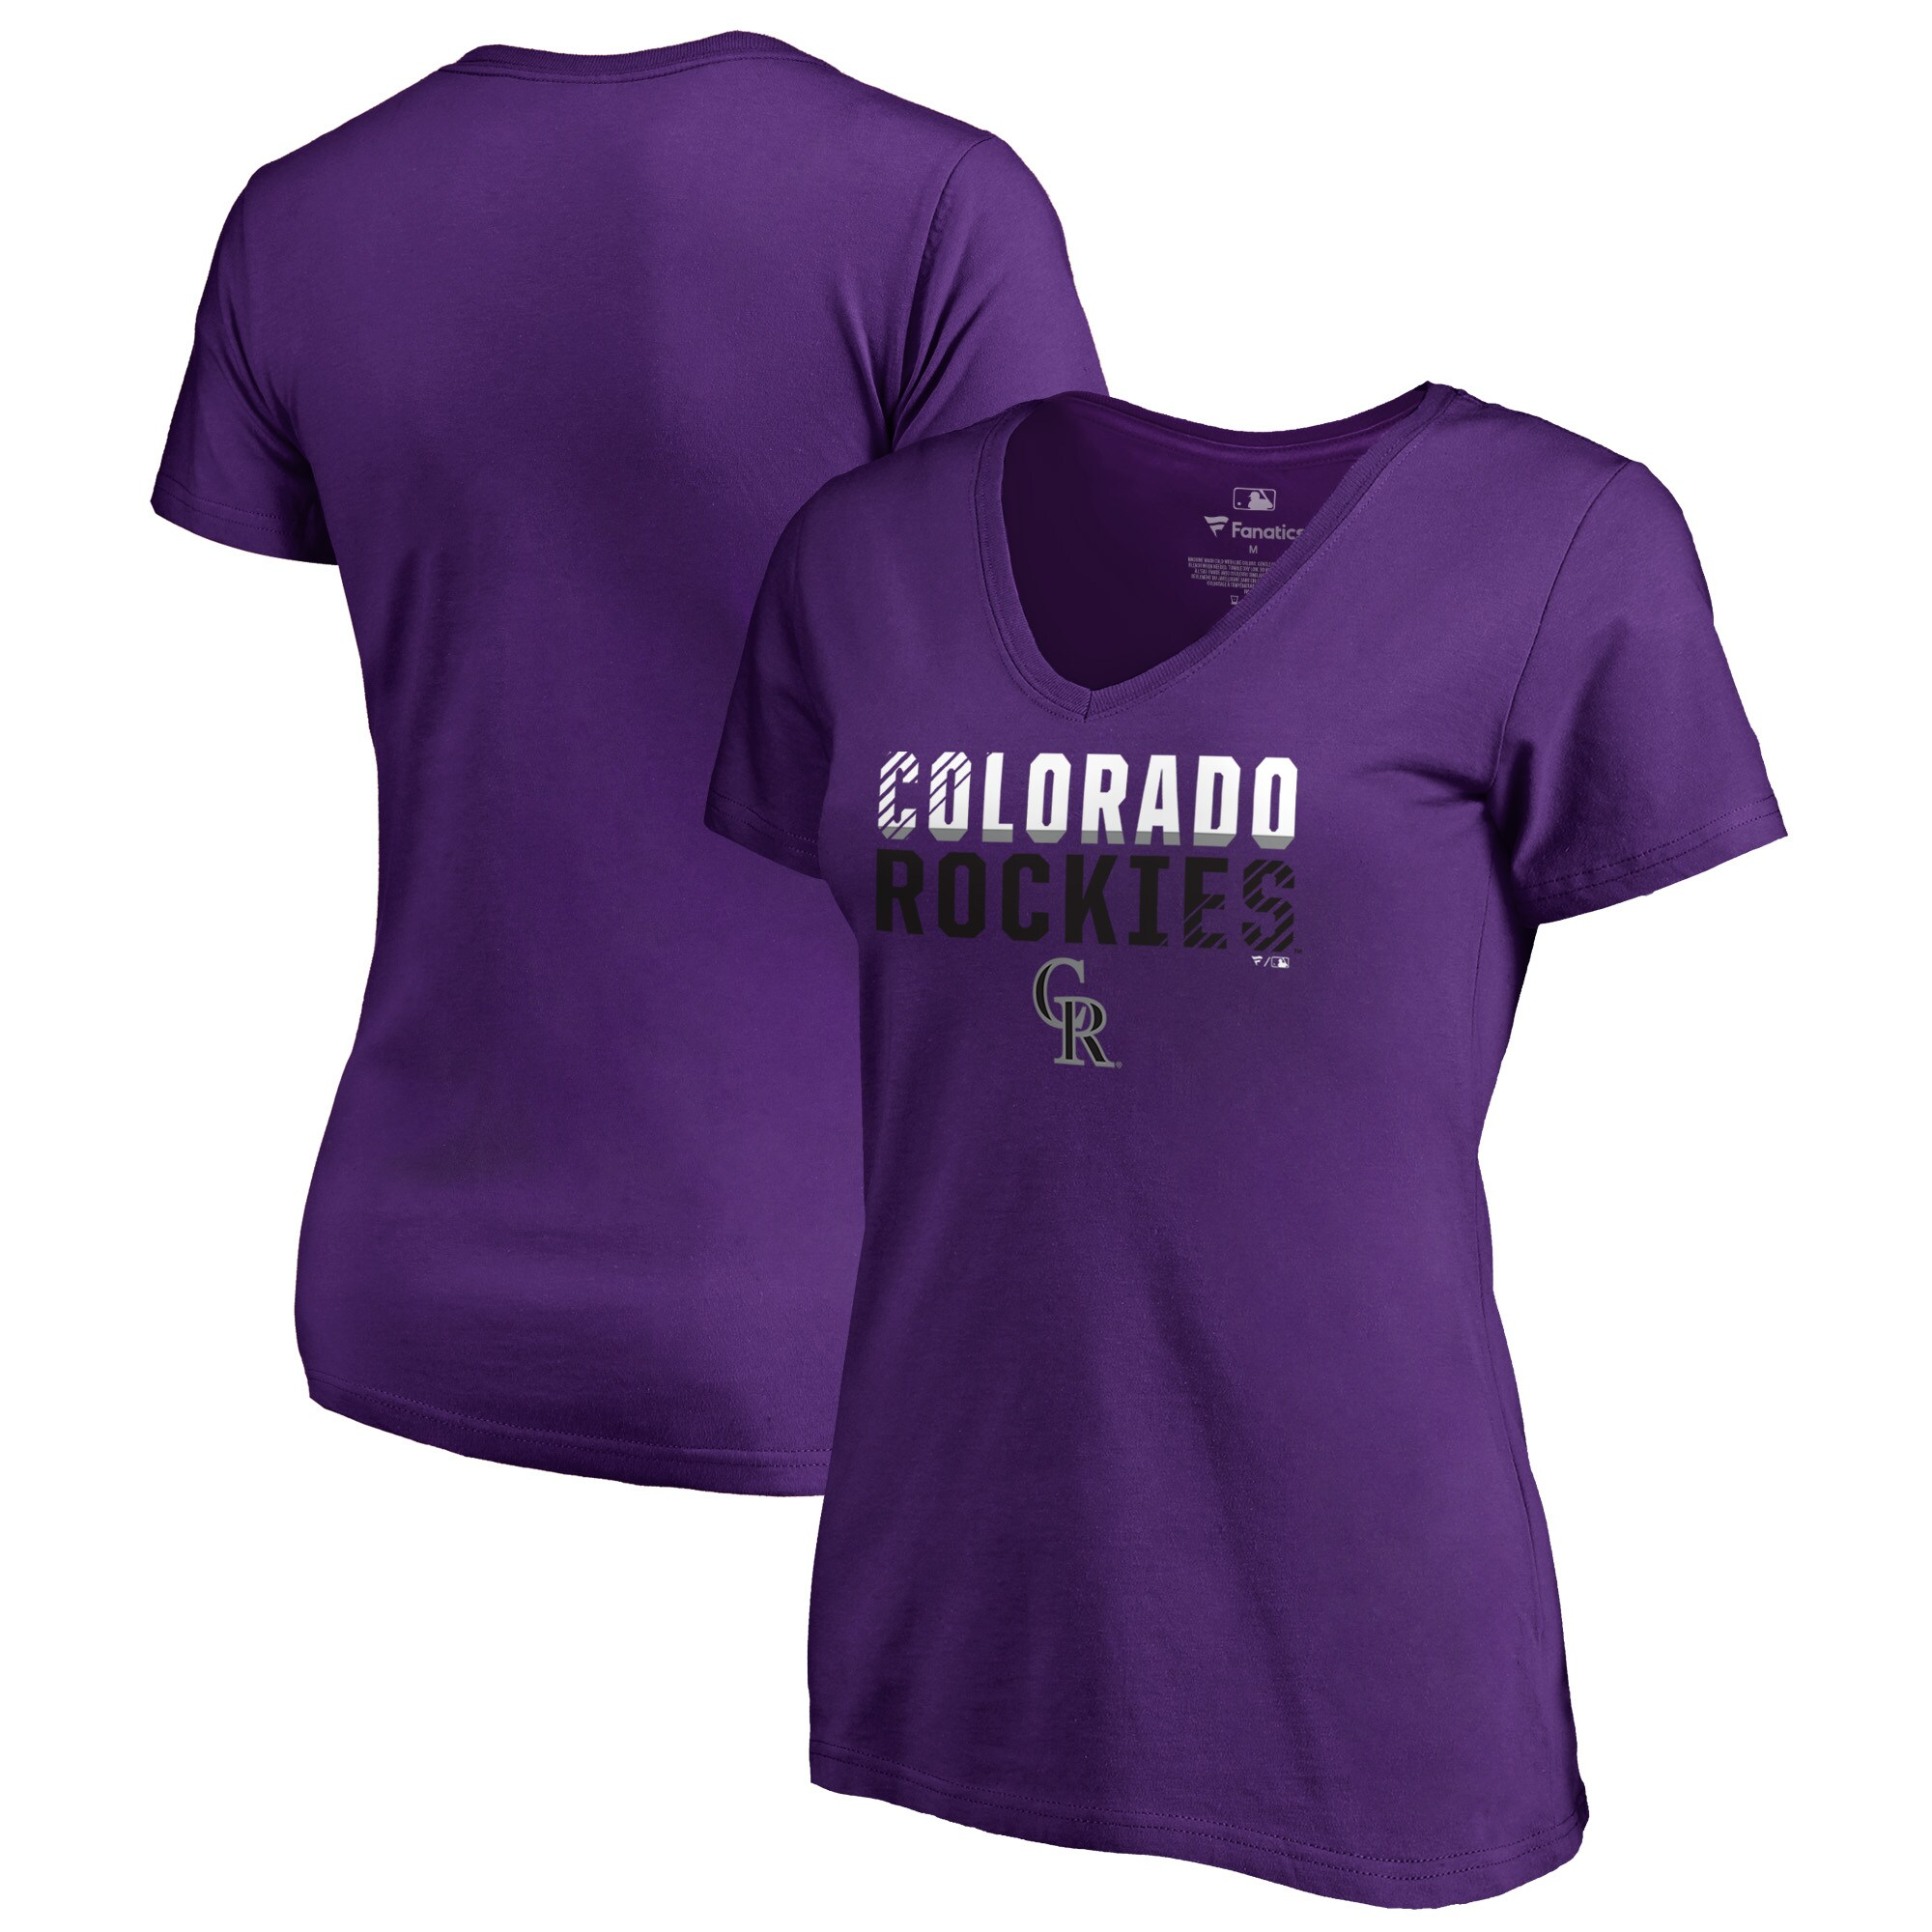 Colorado Rockies Fanatics Branded Women's Fade Out Plus Size V-Neck T-Shirt - Purple